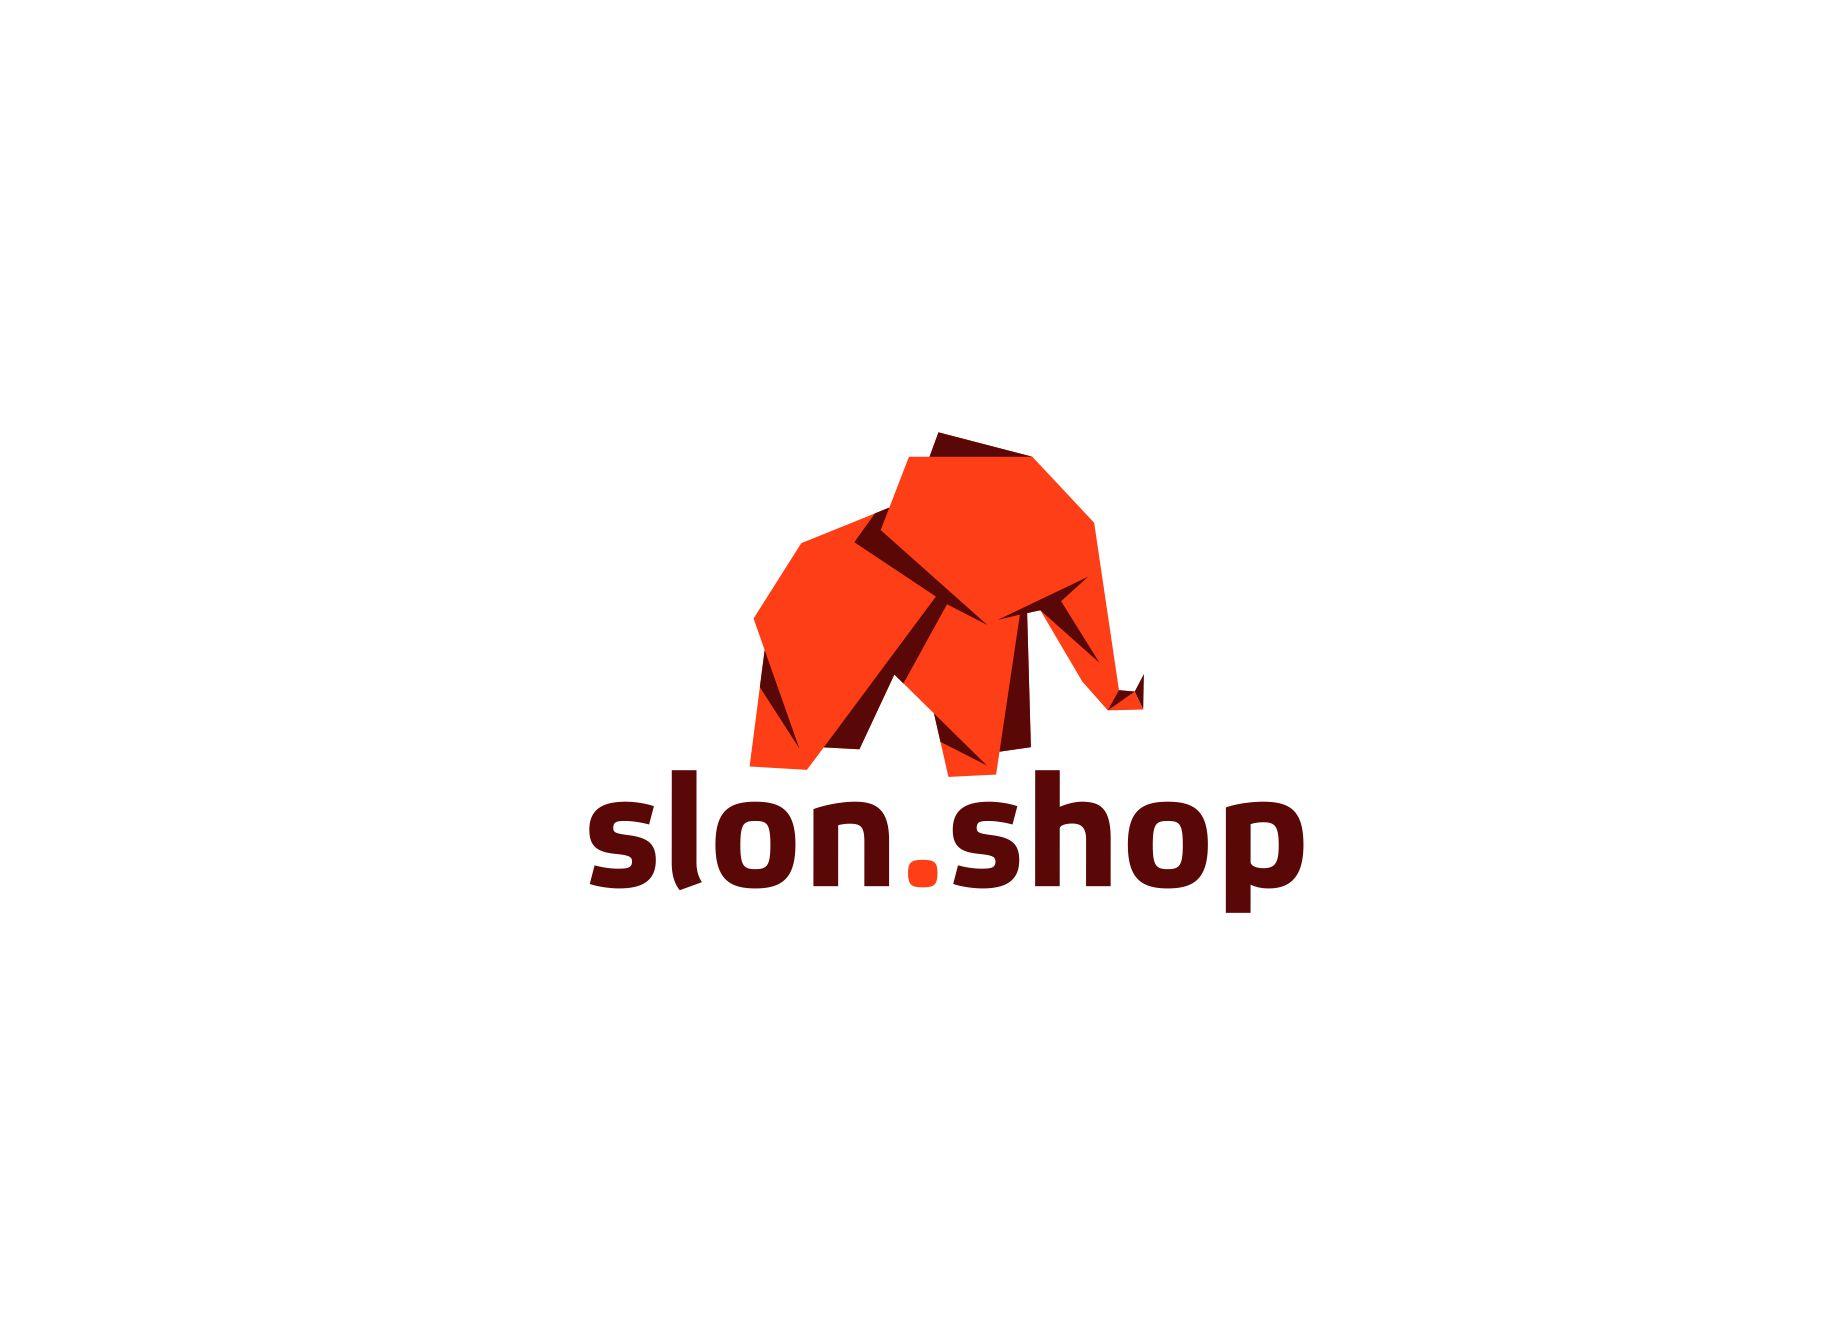 Разработать логотип и фирменный стиль интернет-магазина  фото f_821598c7c9e2c56e.jpg